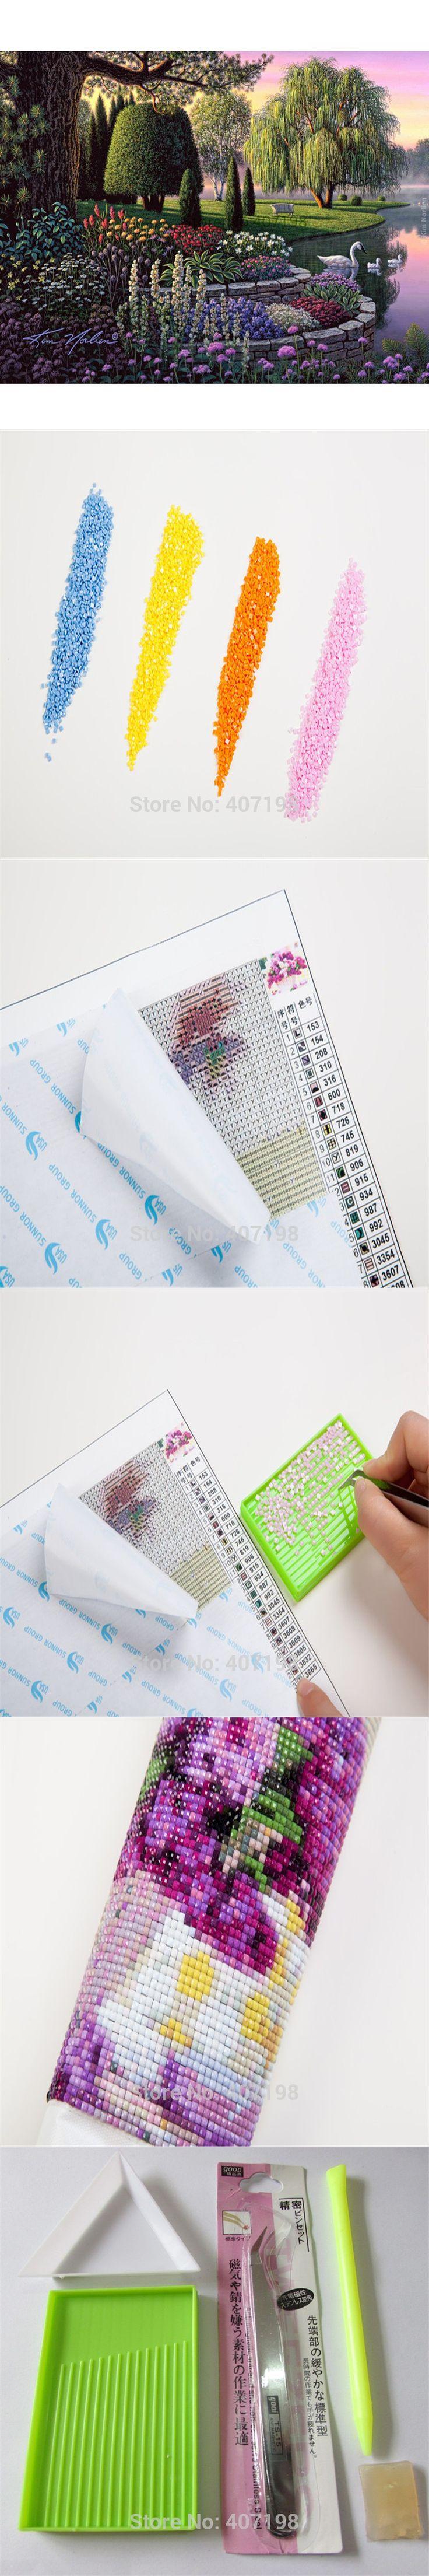 4b92a93ff21 Diy 3D Diamond painting Mosaic Diamond Embroidery cross stitch pattern Full  square Needlework Crafts Spring scenic Home decor. Cruz De DiamantesPatrones  ...